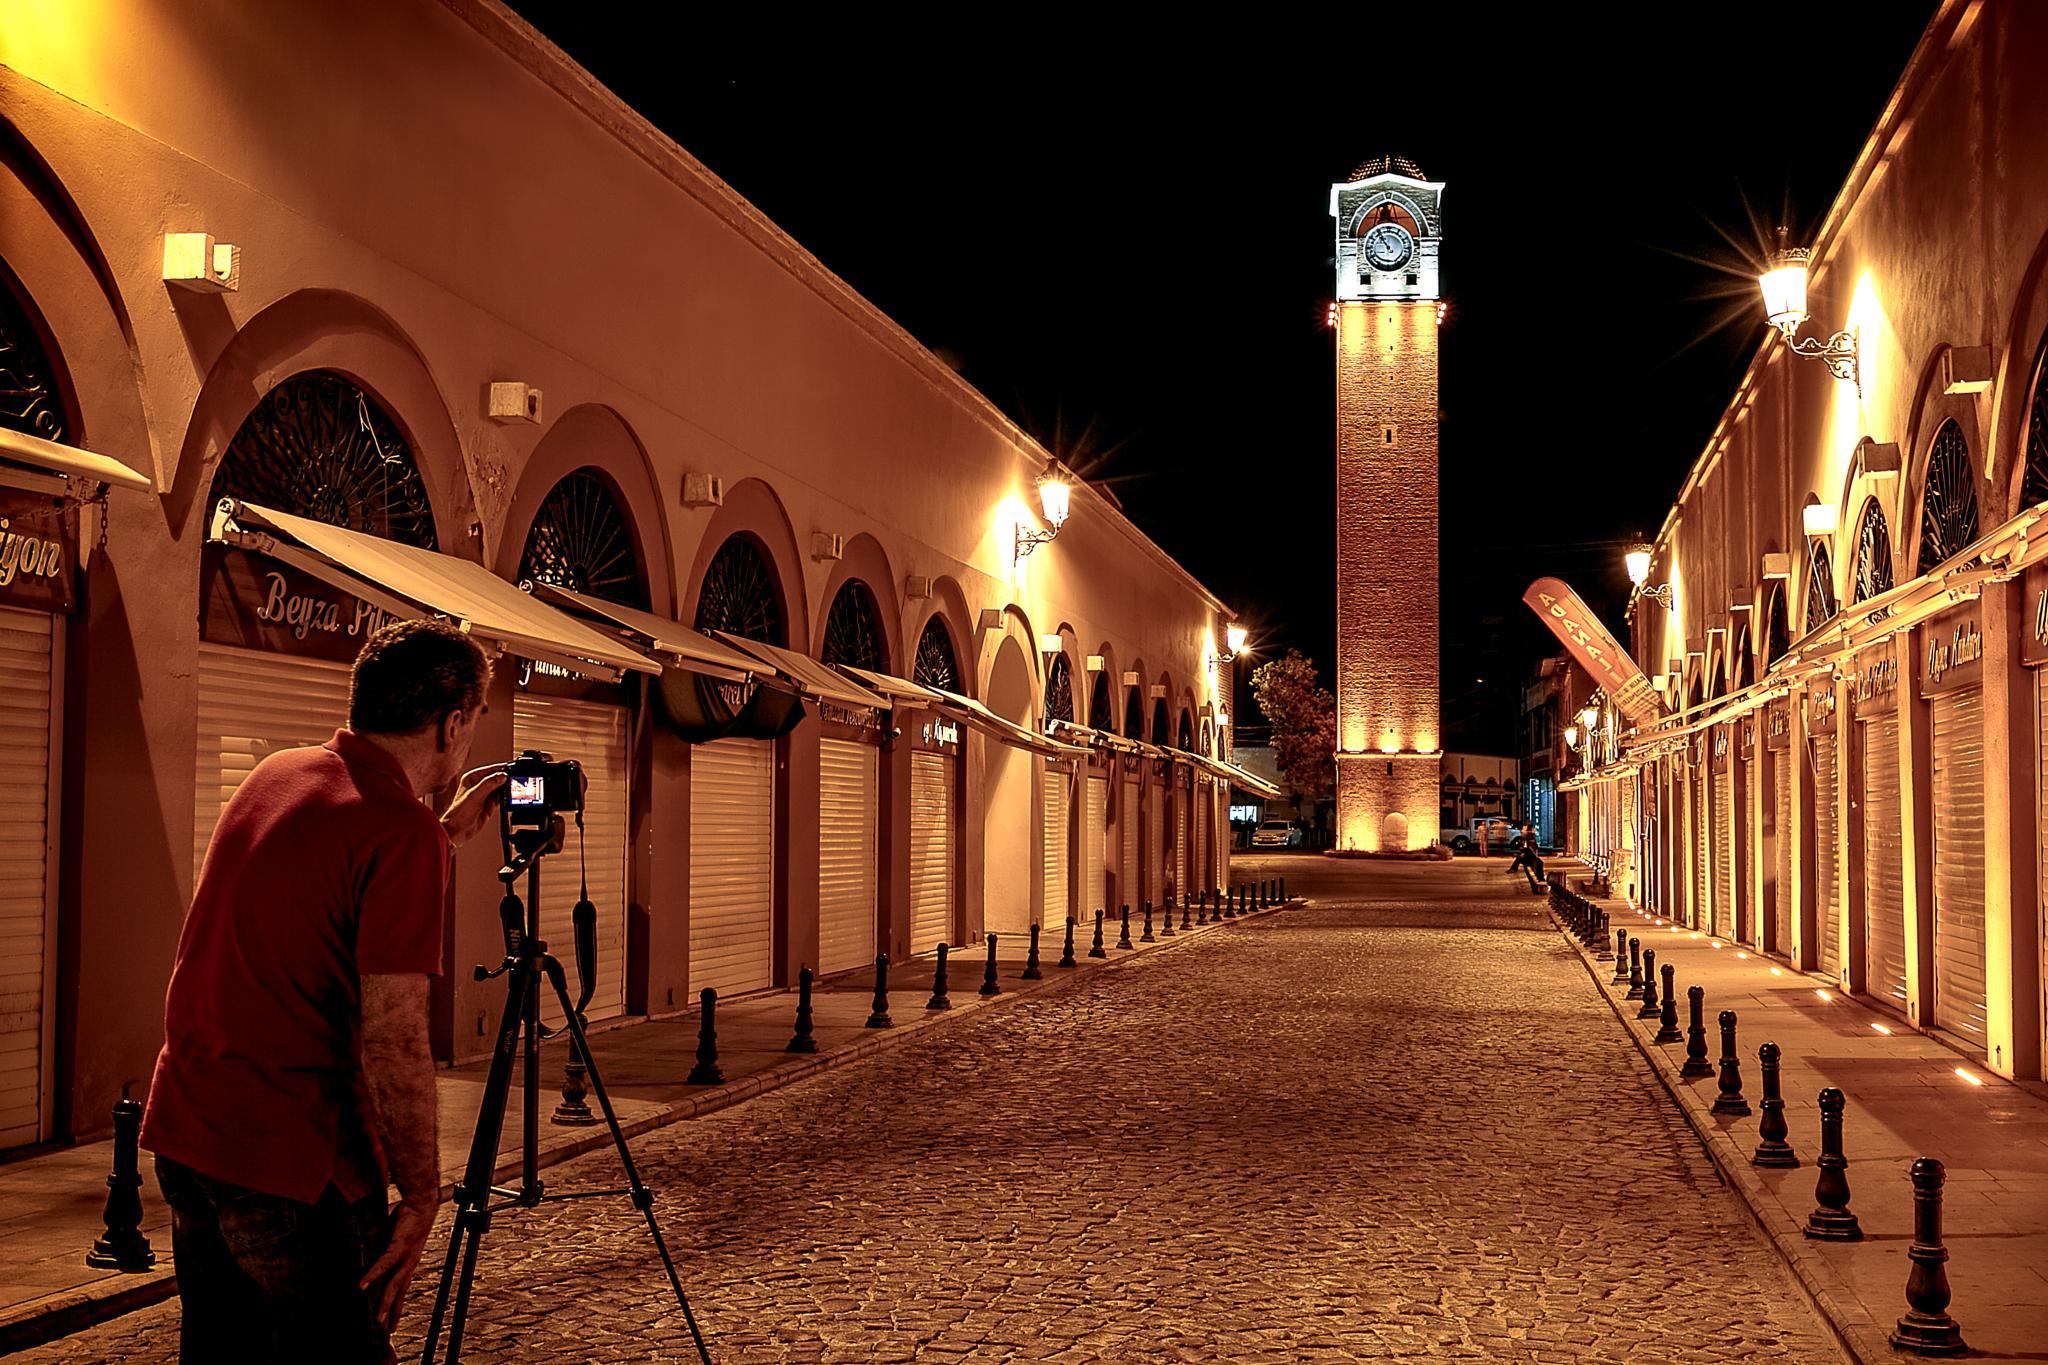 Adana Büyük Saat (The Great Clock Tower) by Bulent Cerci